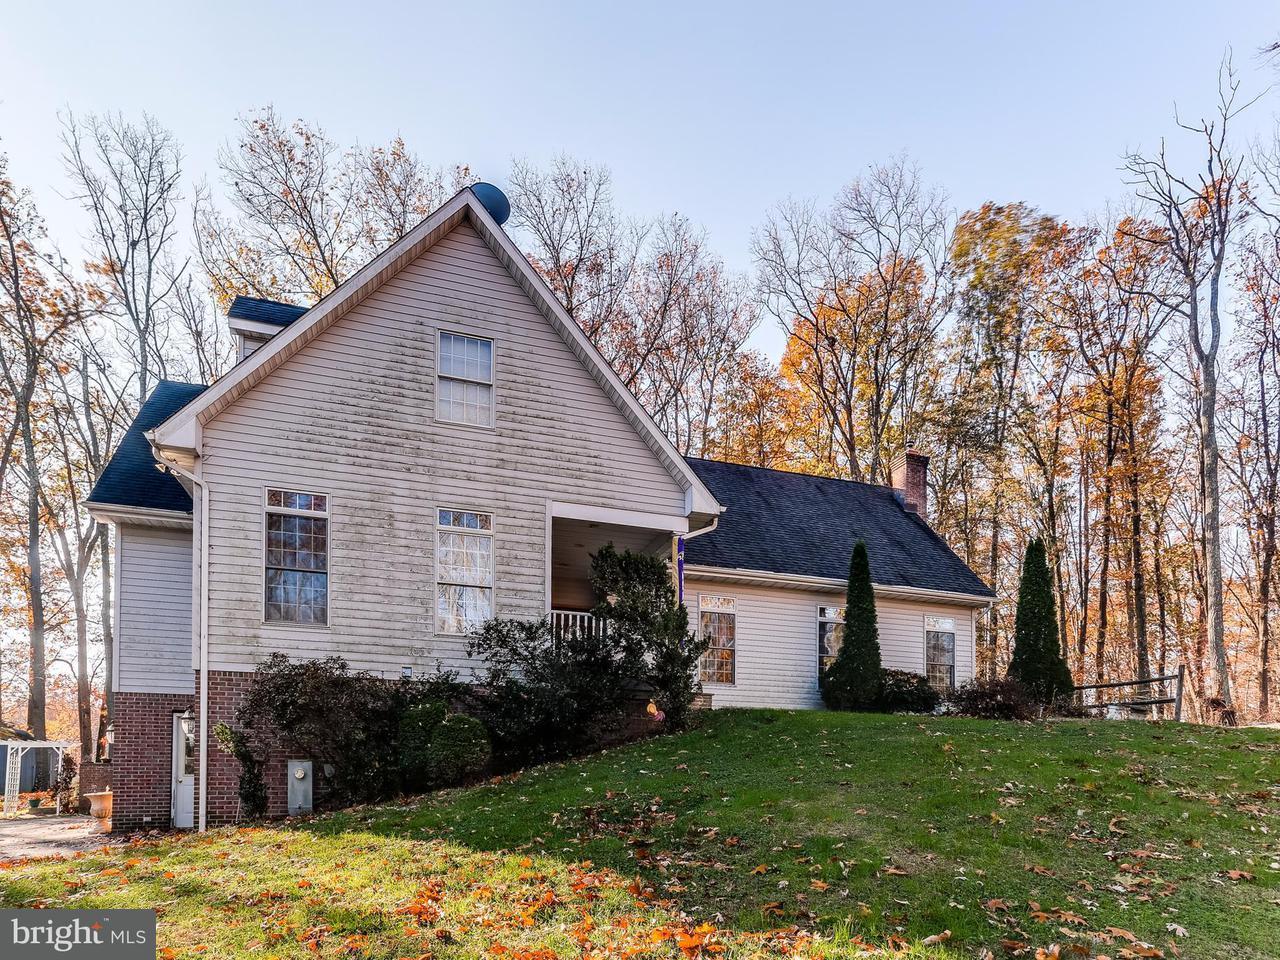 独户住宅 为 销售 在 1521 Cold Bottom Road 1521 Cold Bottom Road Sparks, 马里兰州 21152 美国